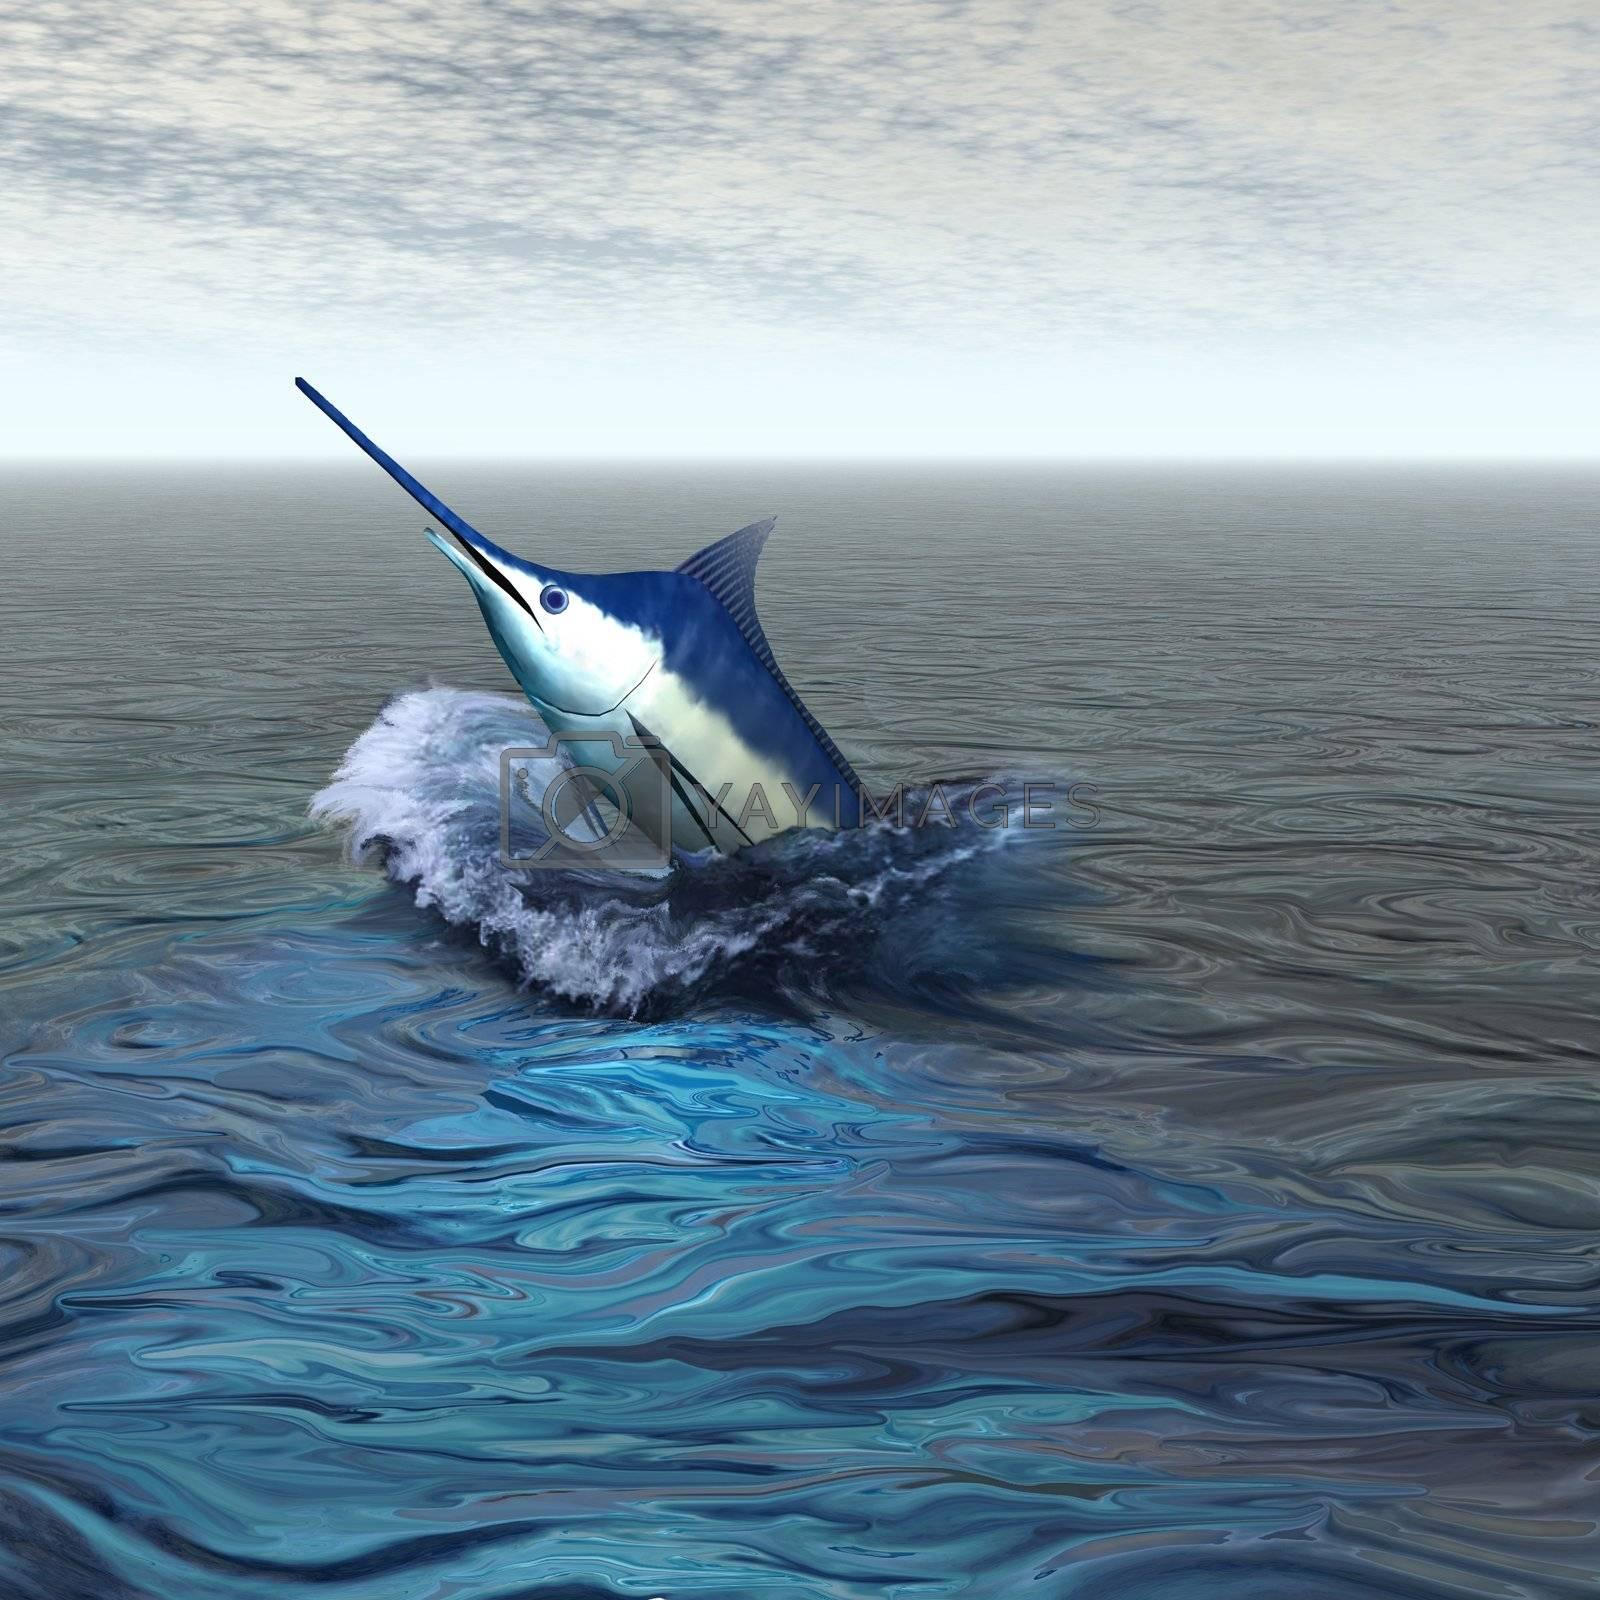 A beautiful marlin breaches from the ocean.